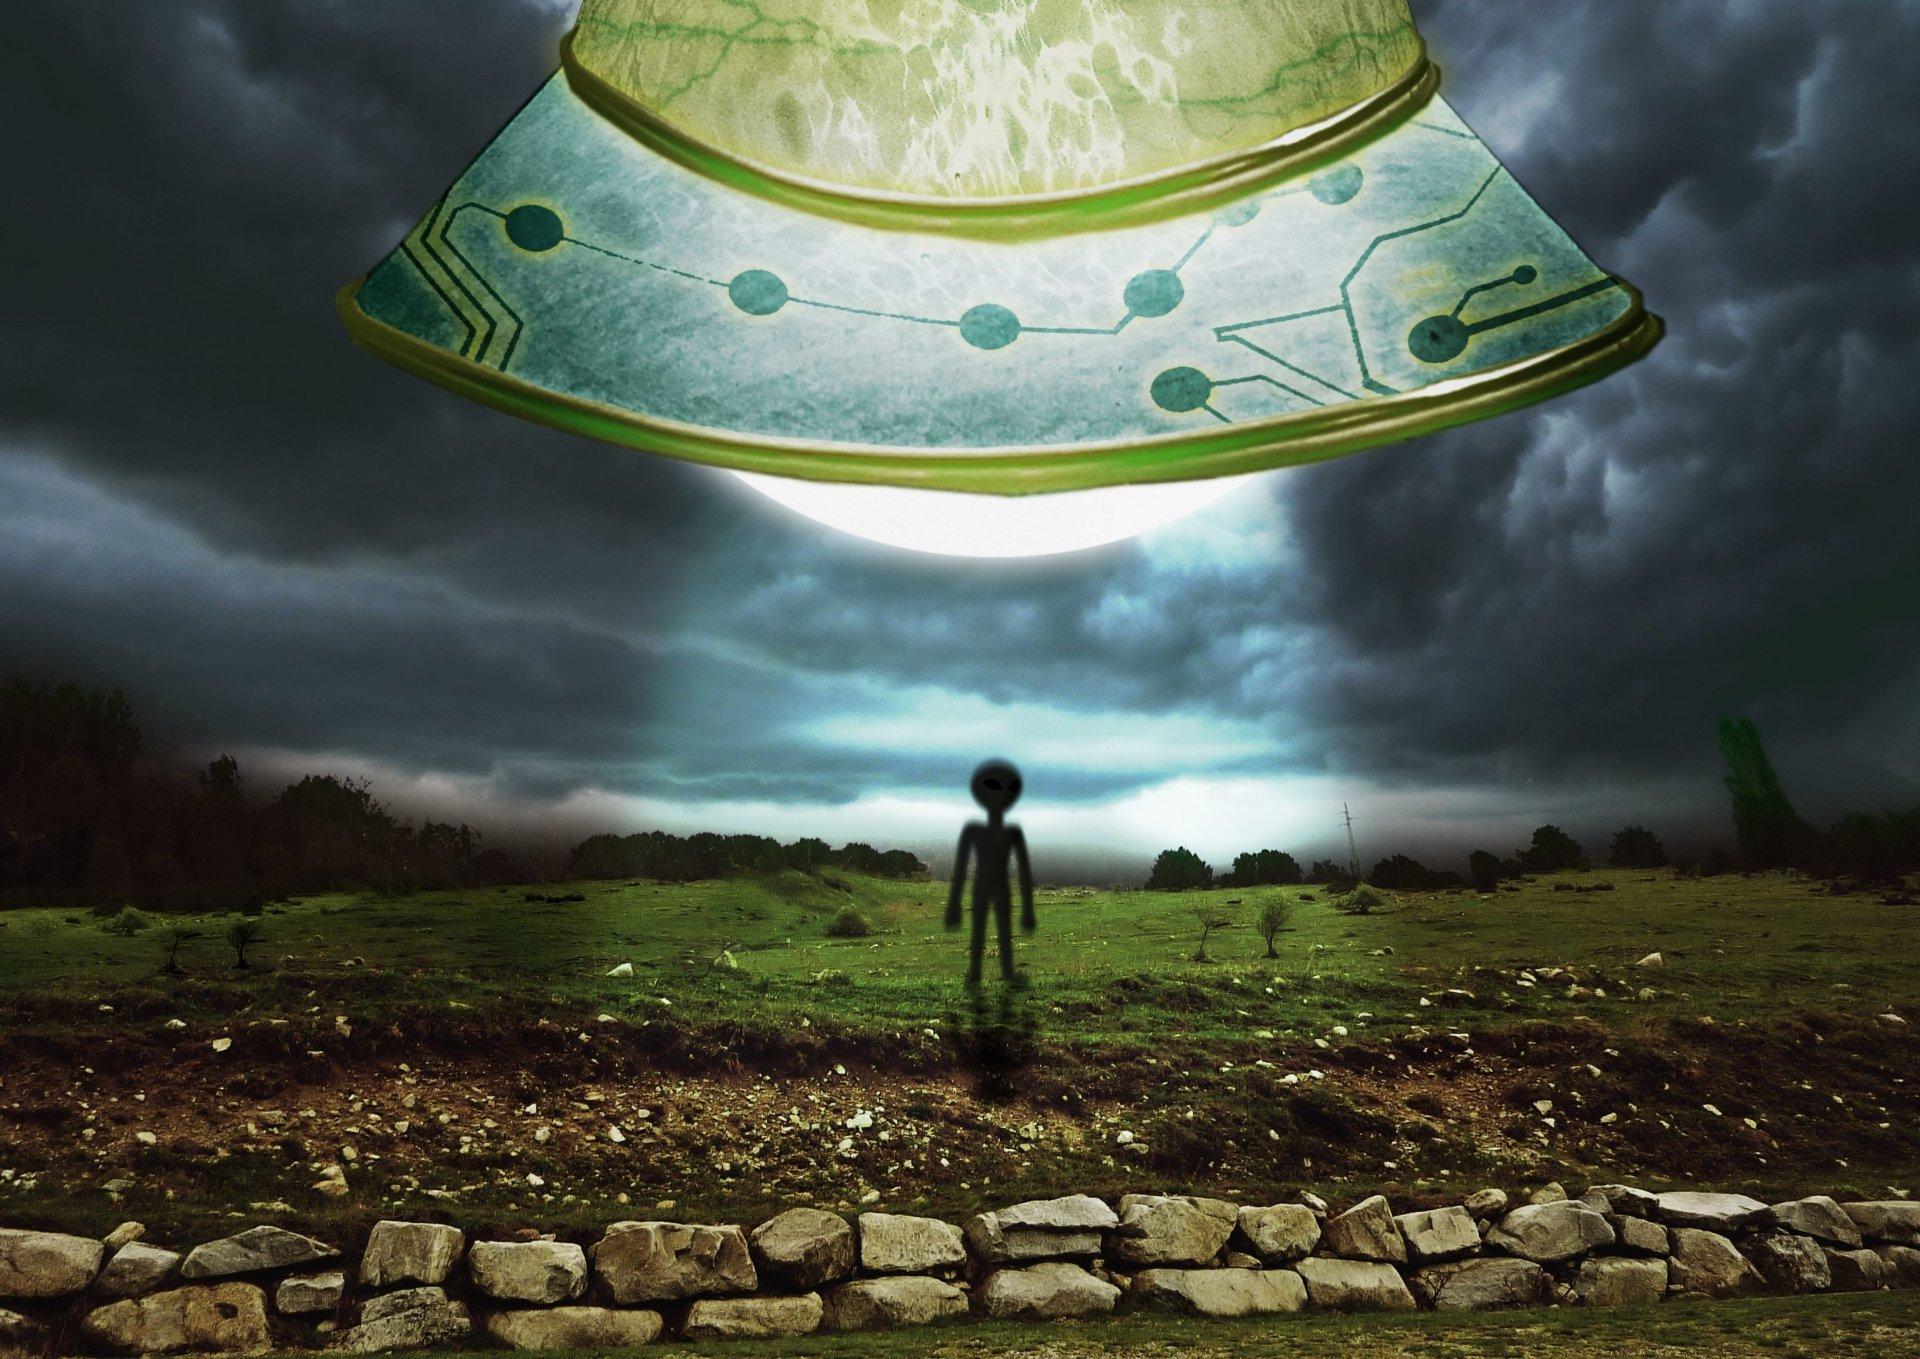 Sci Fi Wallpaper Hd Alien Full Hd Wallpaper And Background Image 3264x2310